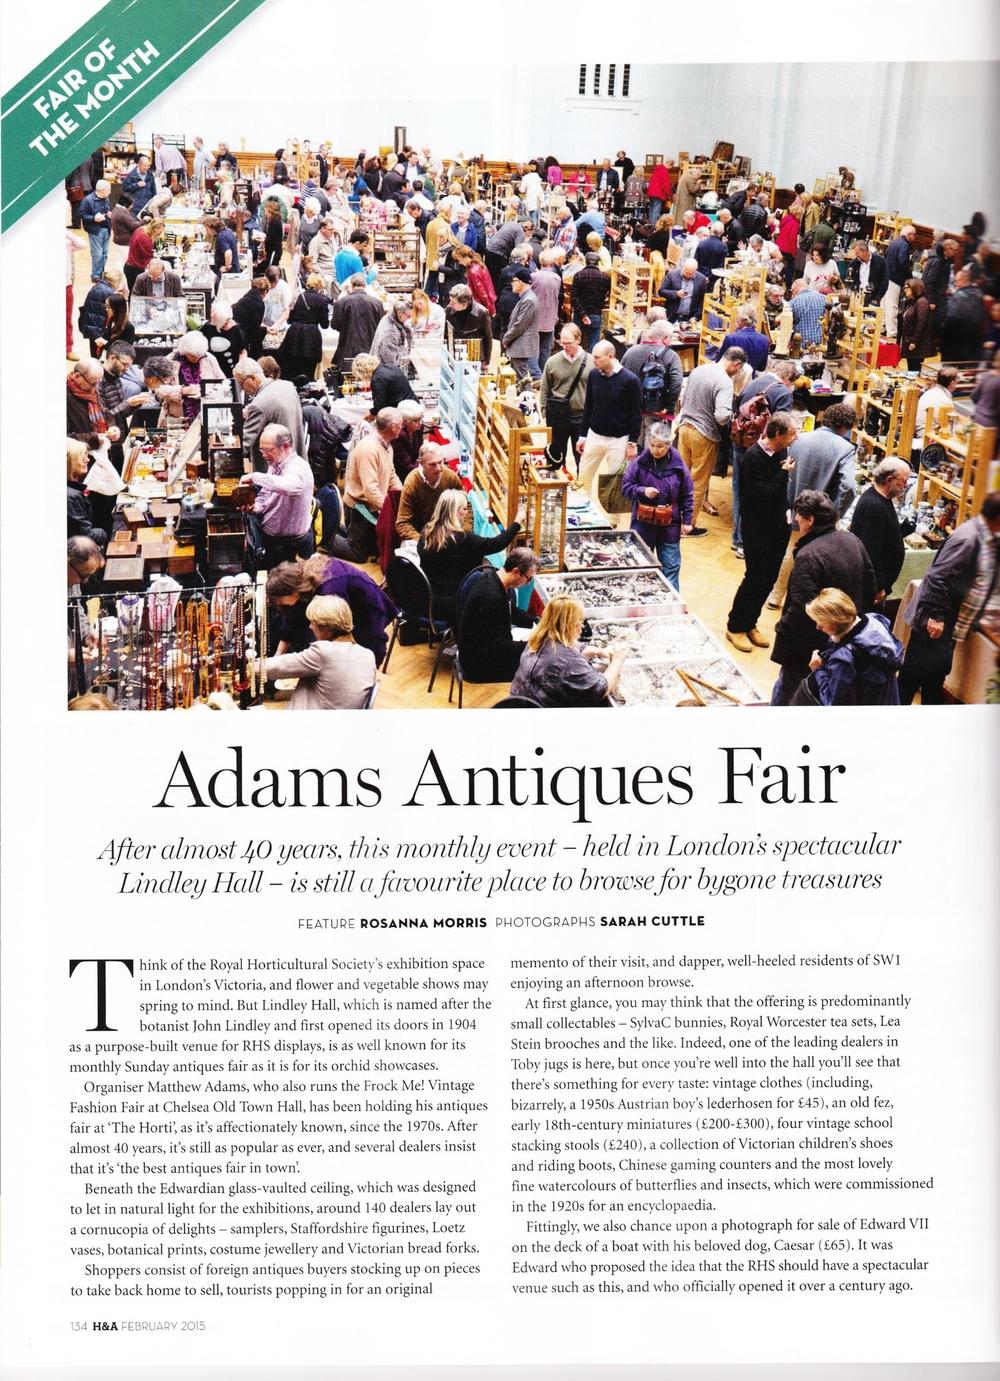 Homes & Antiques Magazine, February 2015